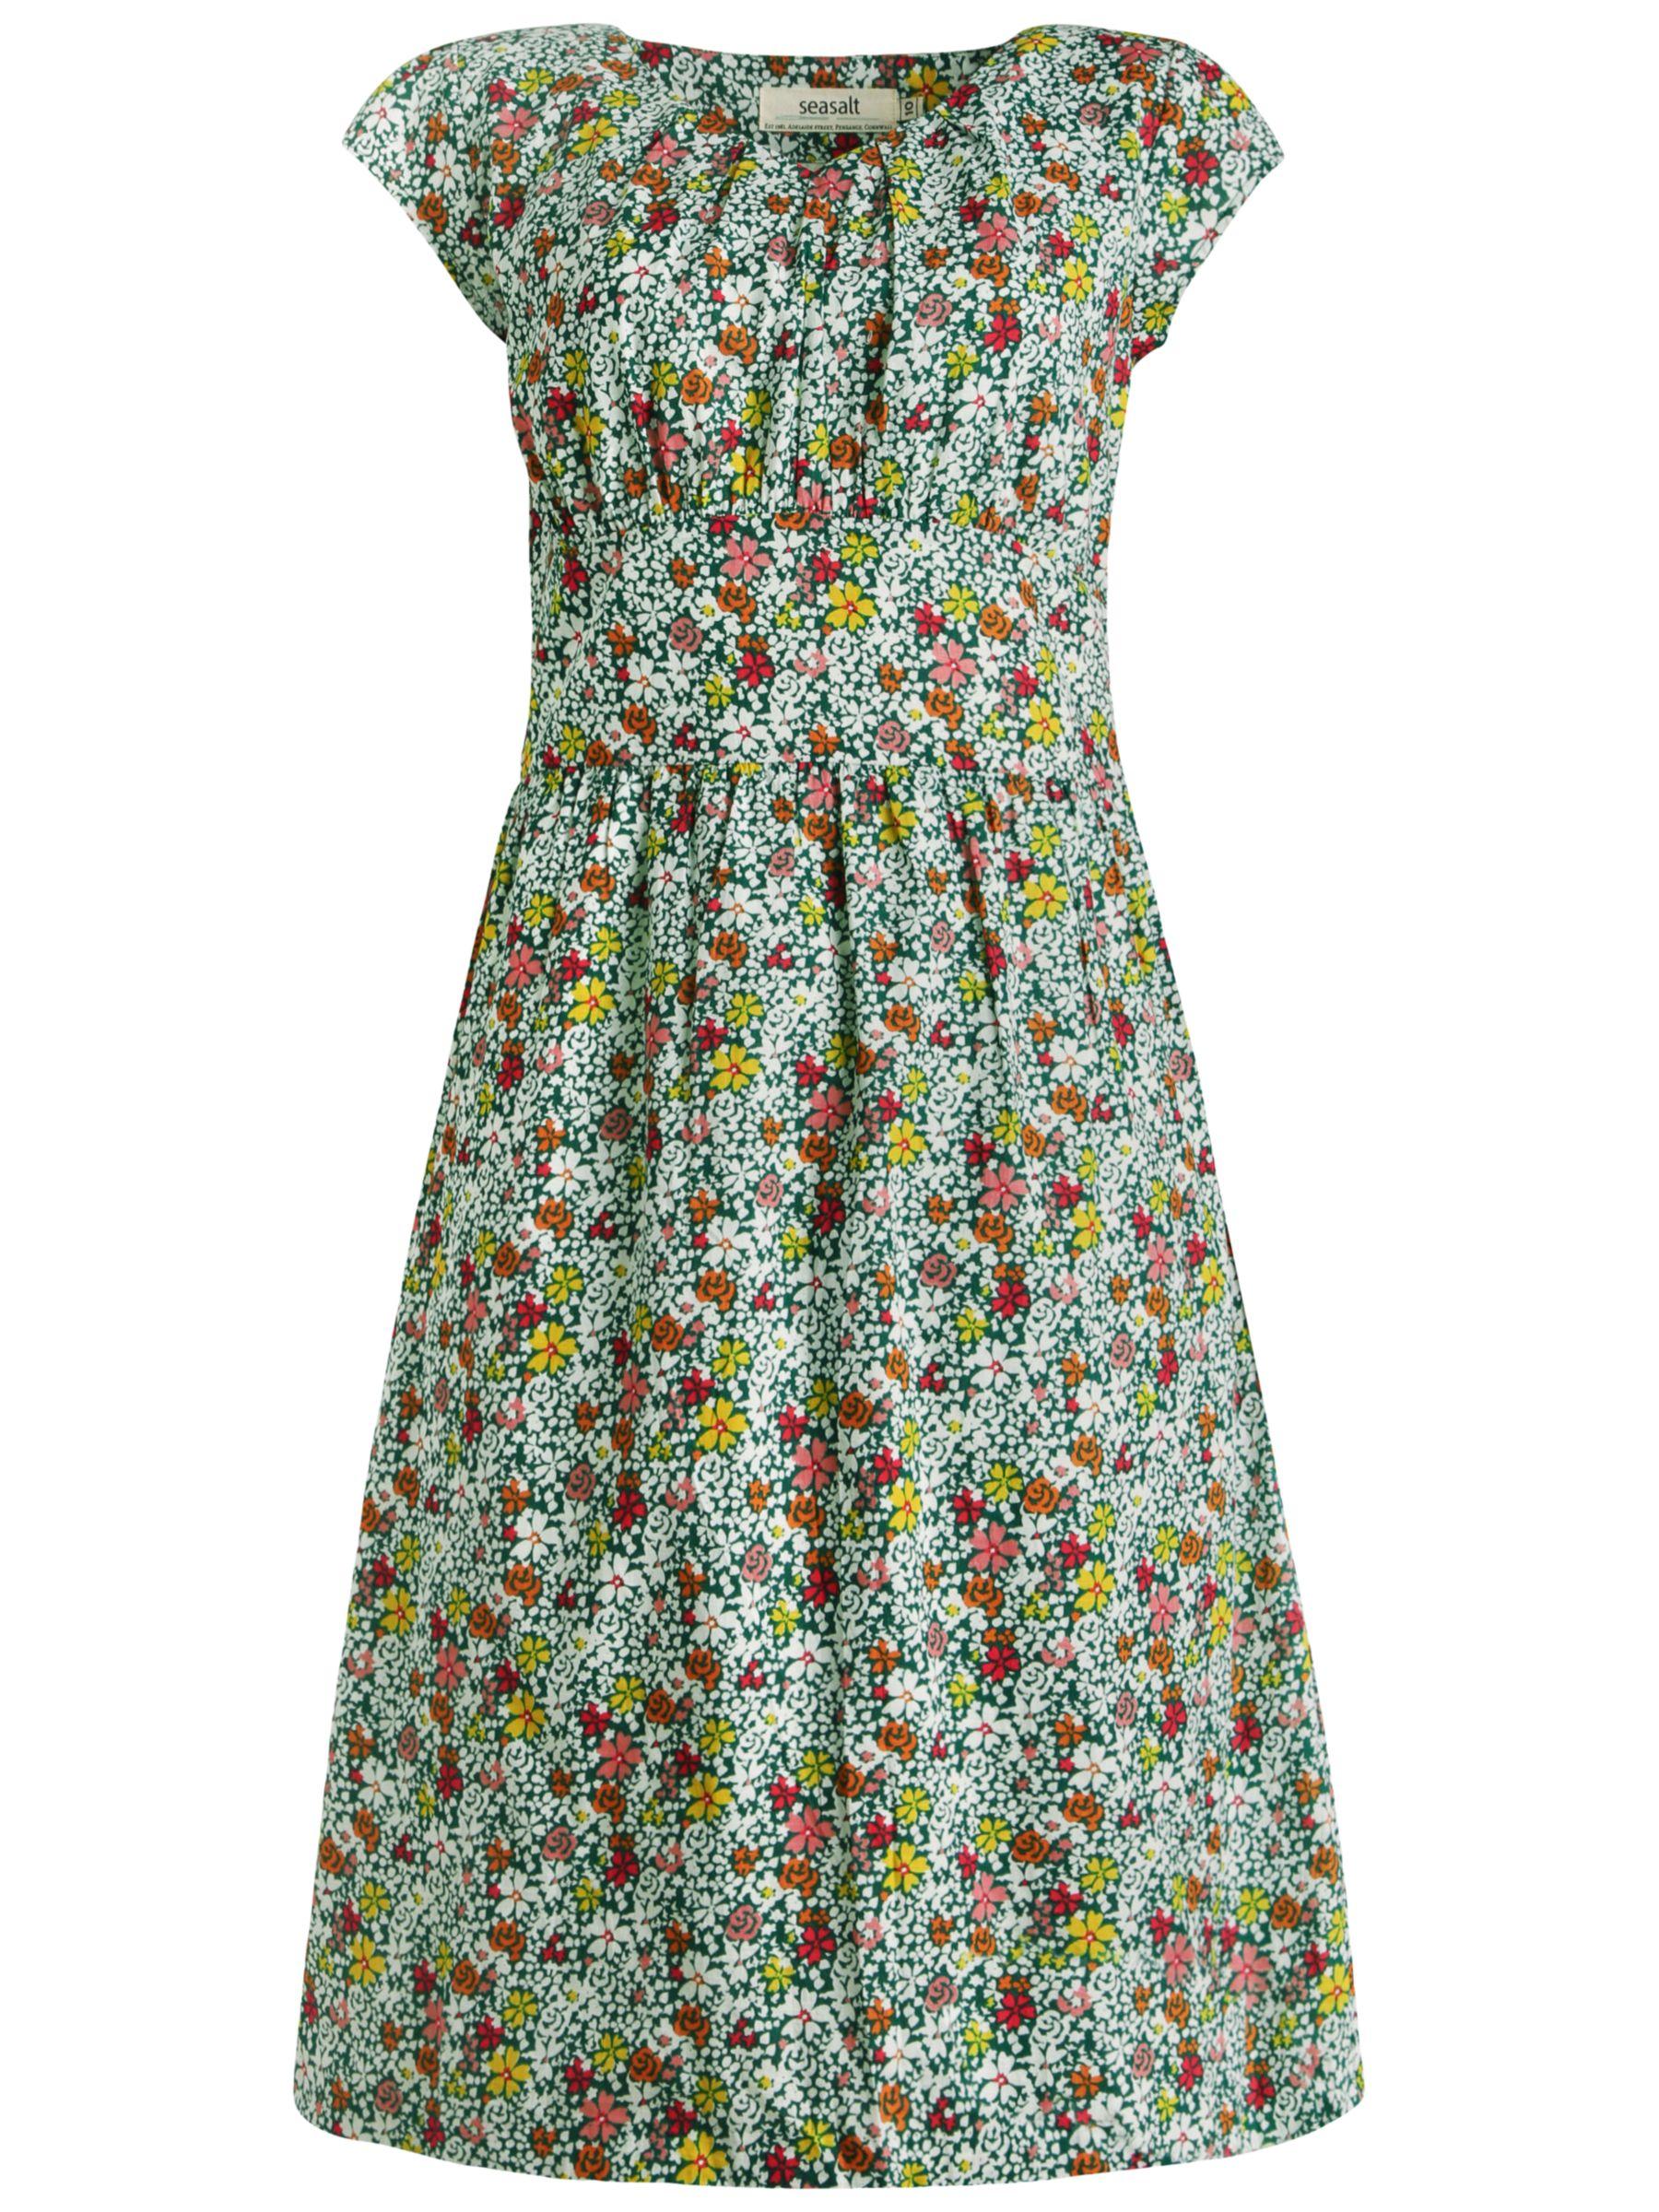 seasalt abstract floral dress vintage floral drake, seasalt, abstract, floral, dress, vintage, drake, 12|10|8|14|16, women, womens dresses, 1938212